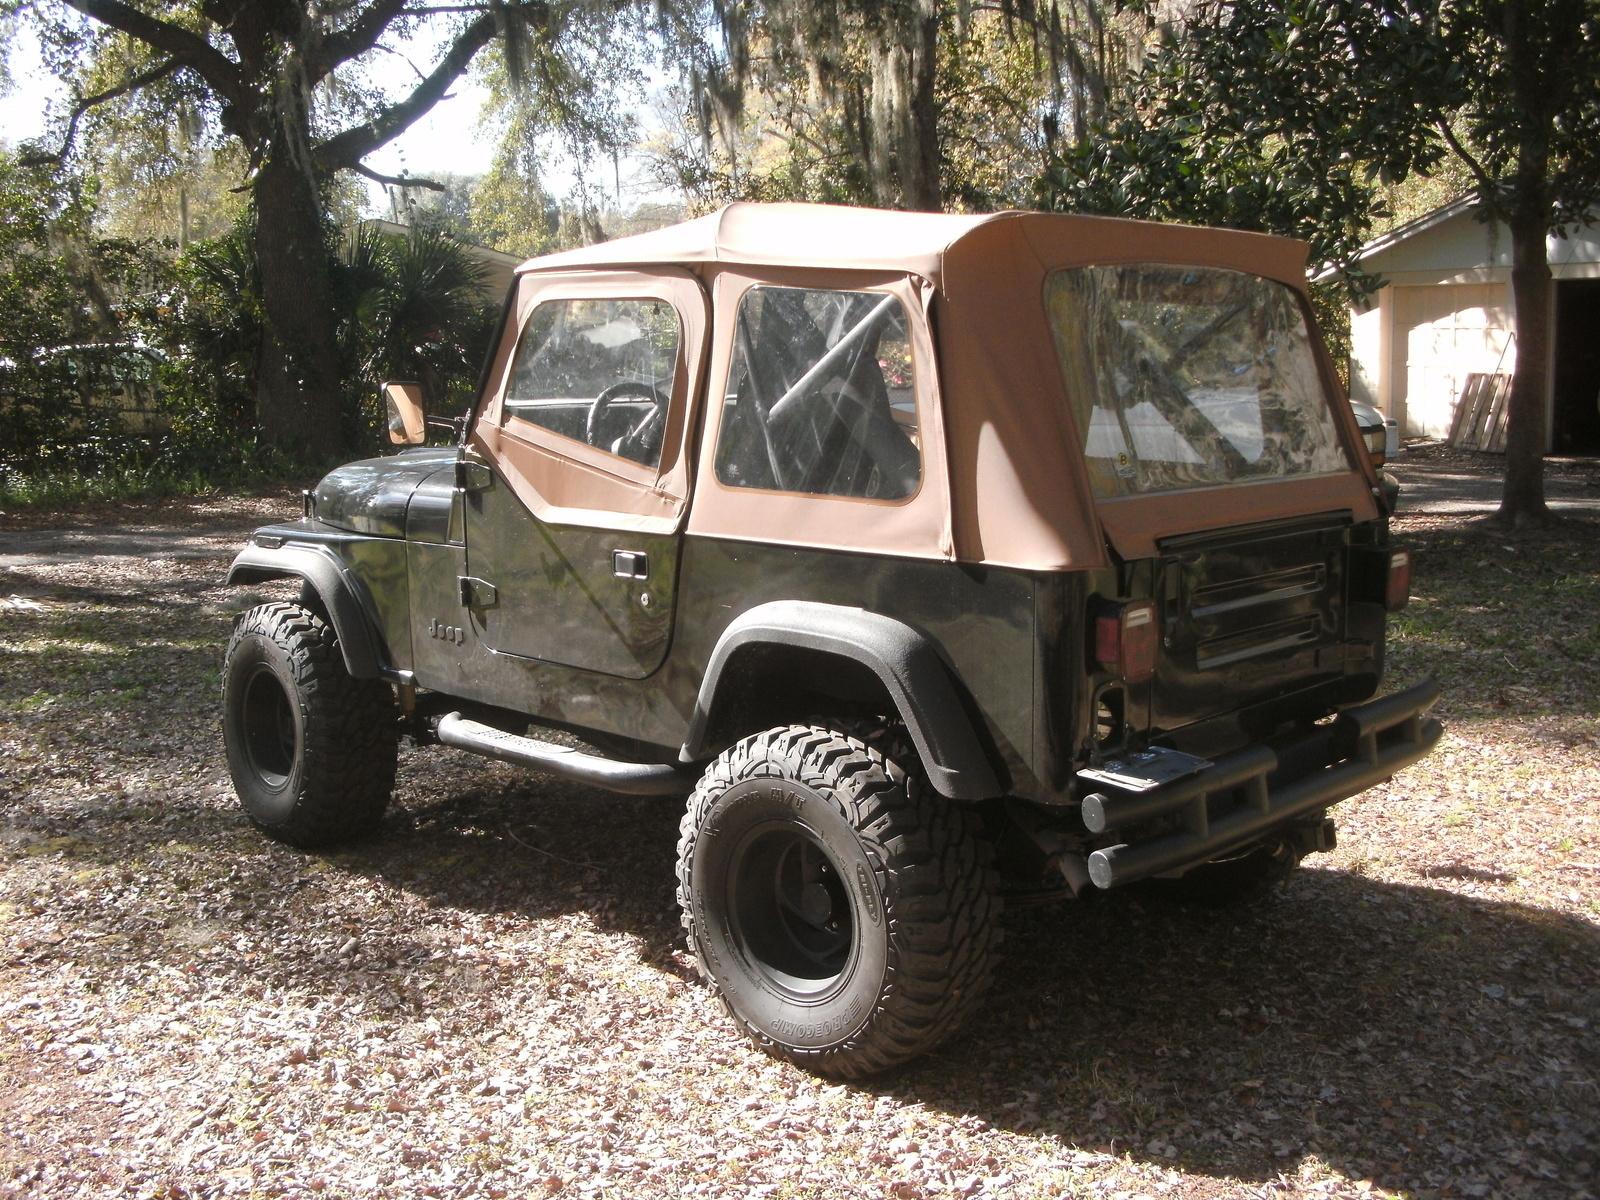 1986 Jeep Cj-7 - Overview